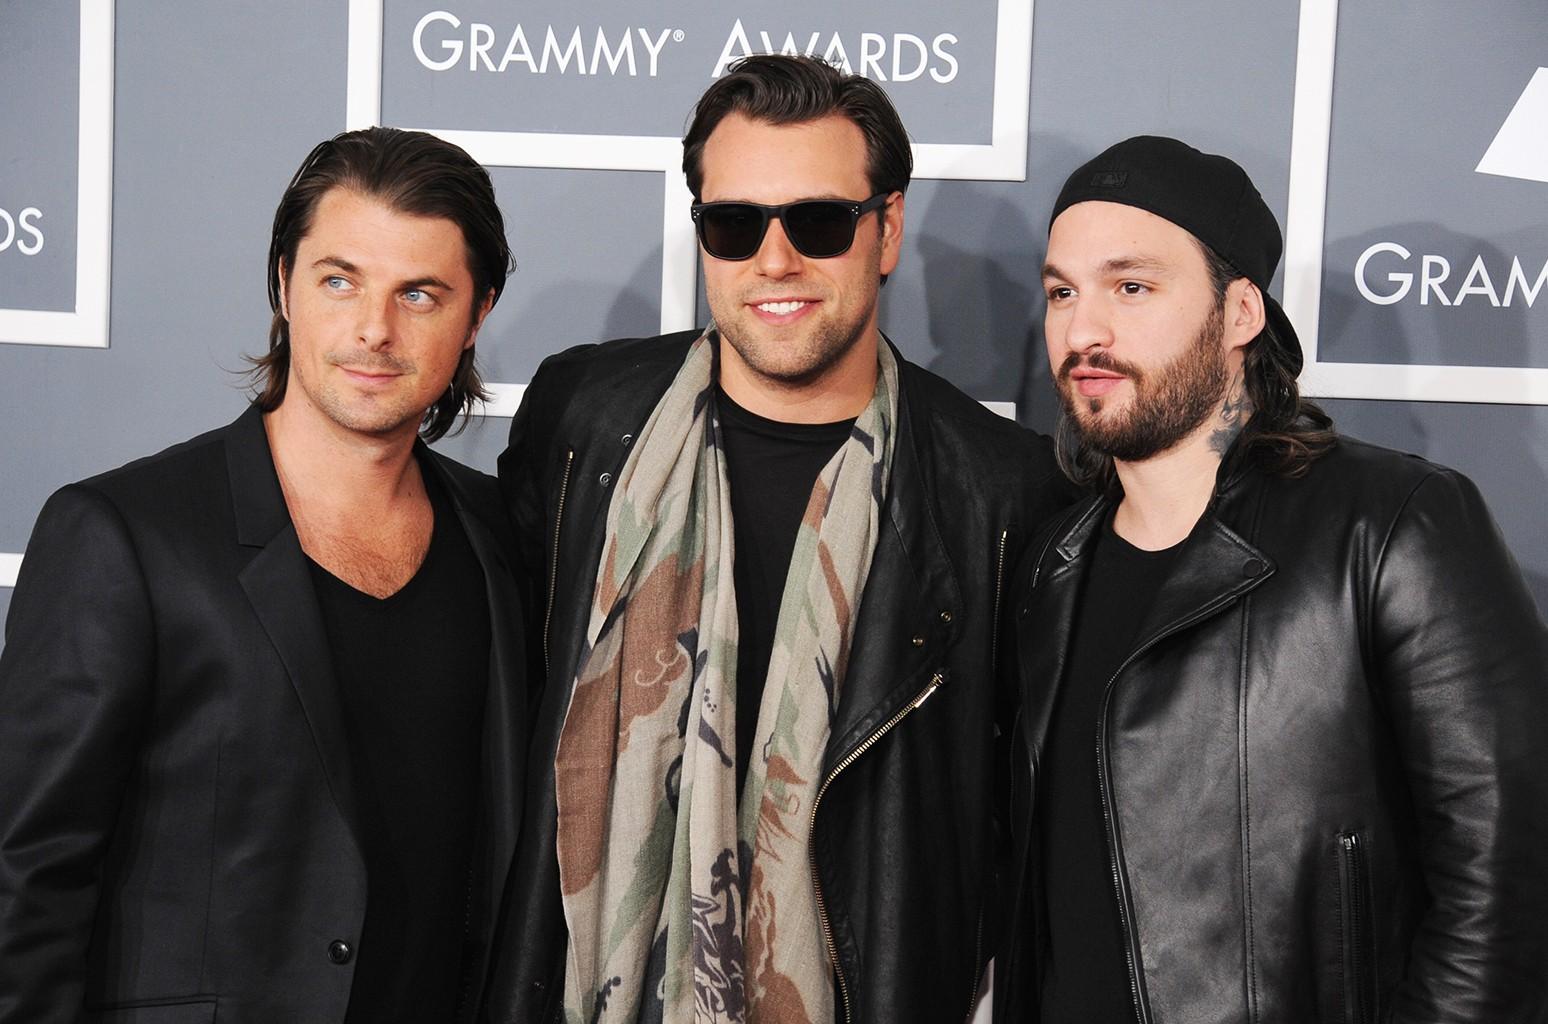 Swedish House Mafia attend the 55th Annual Grammy Awards